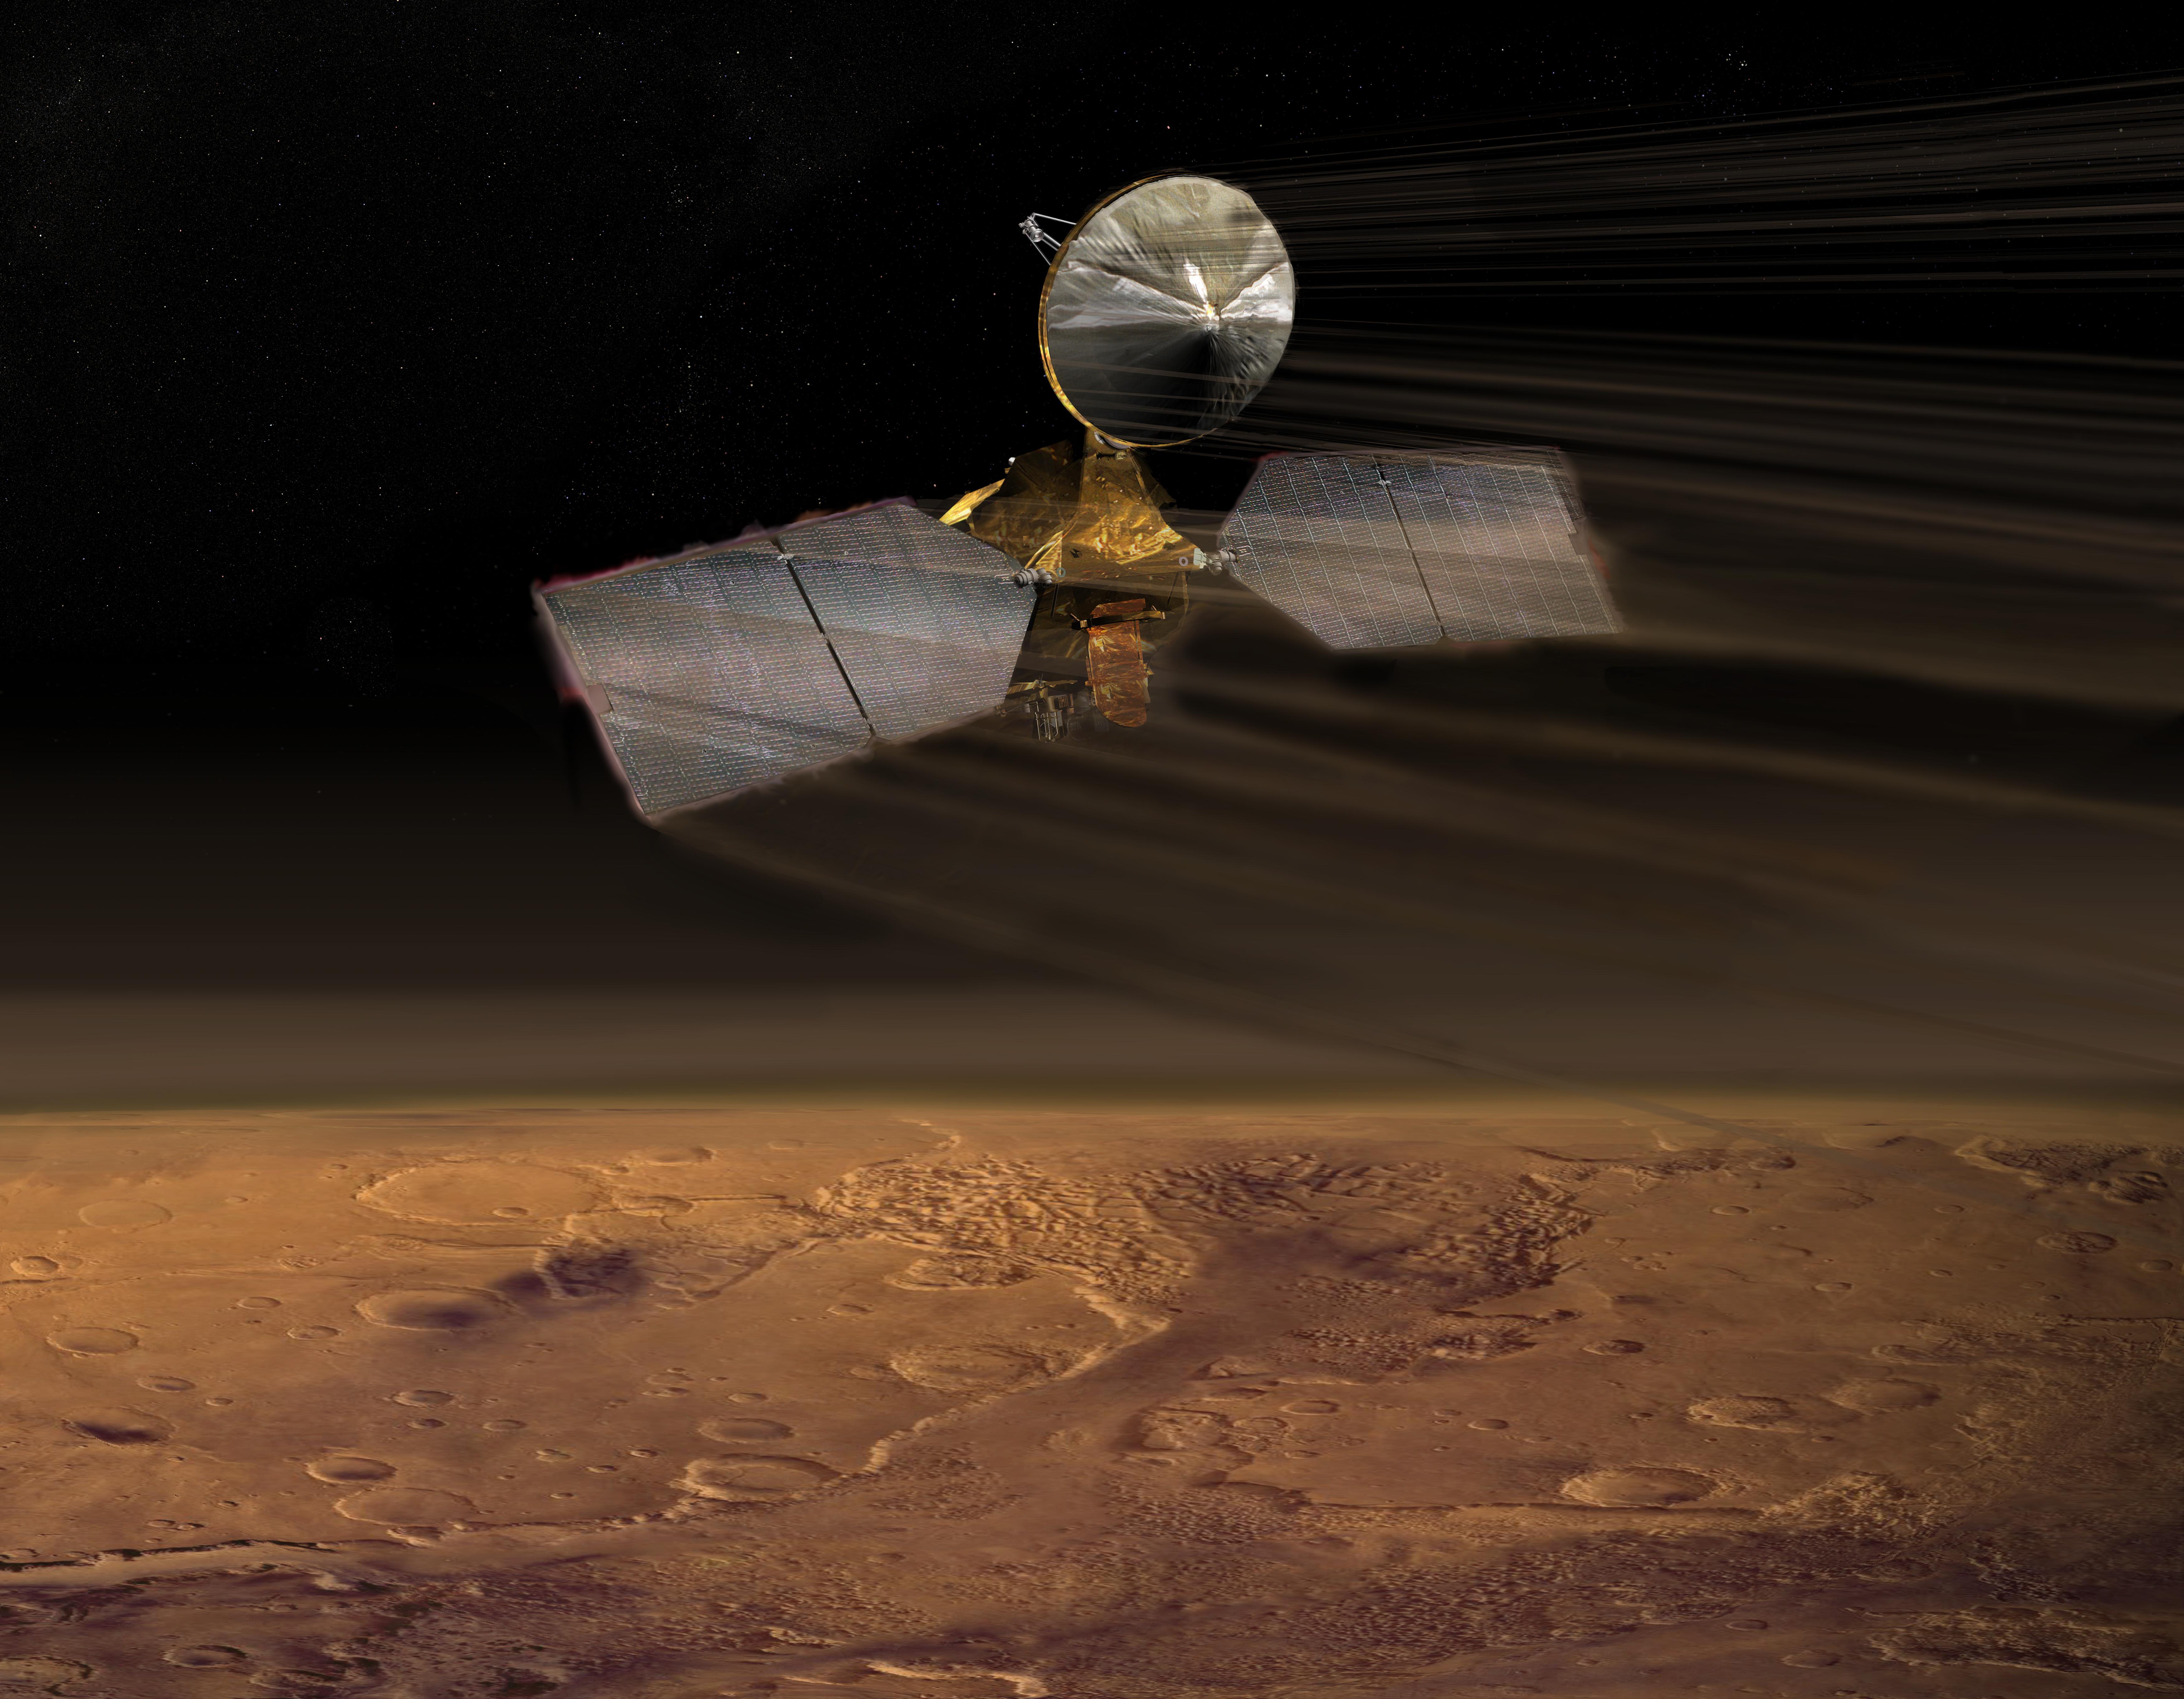 Artists Impression of MRO Aerobraking (credit JPL and Wikipedia)